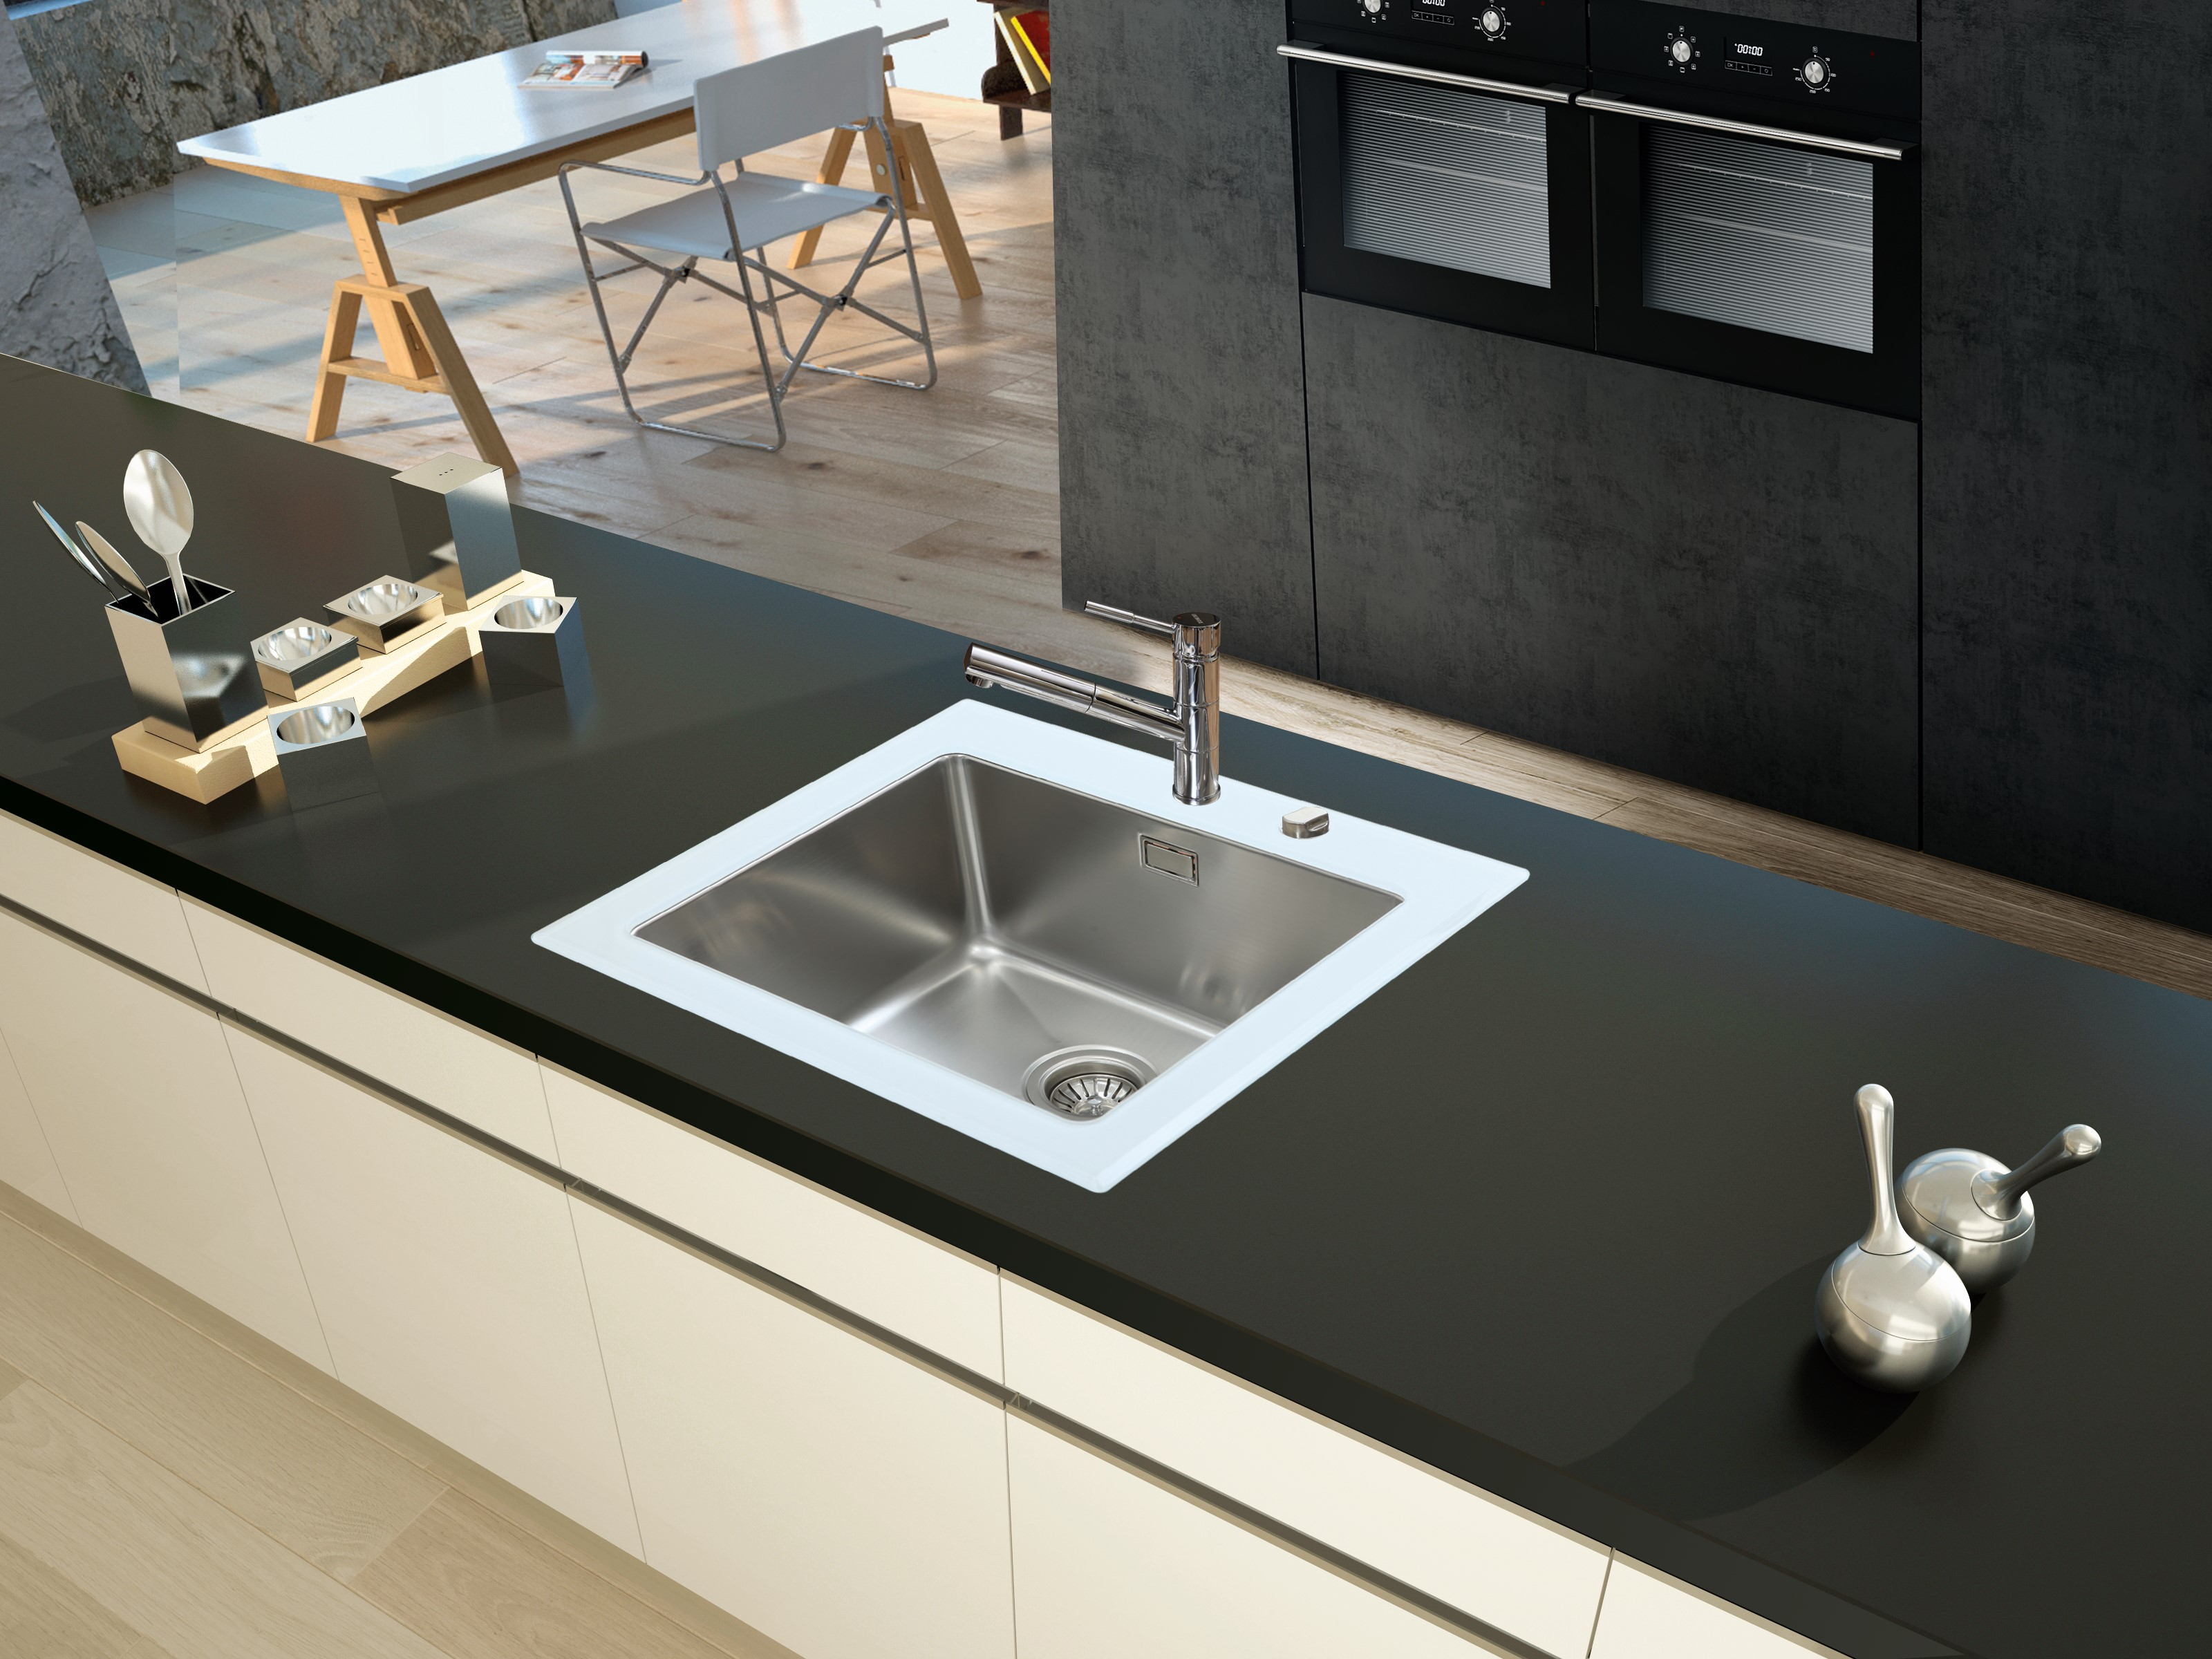 respekta Spüle Einbauspüle Glasspüle Küchenspüle Glas Edelstahl 55 x 53 weiß